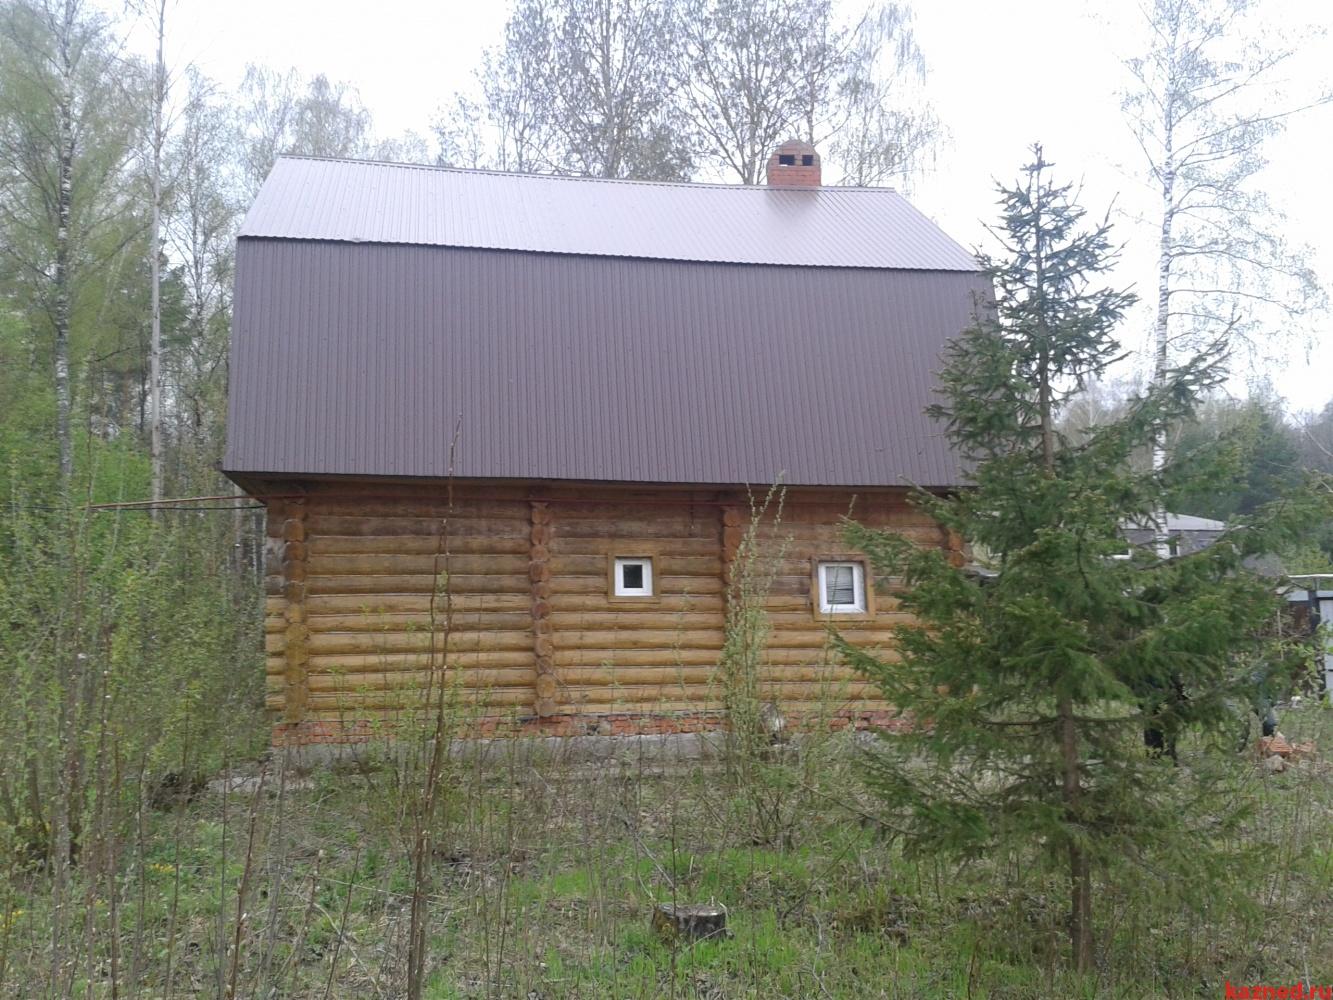 Продажа  дома Казань, Республика Татарстан,  Центральная (Крутушкй) ул, 61, 73 м2  (миниатюра №2)